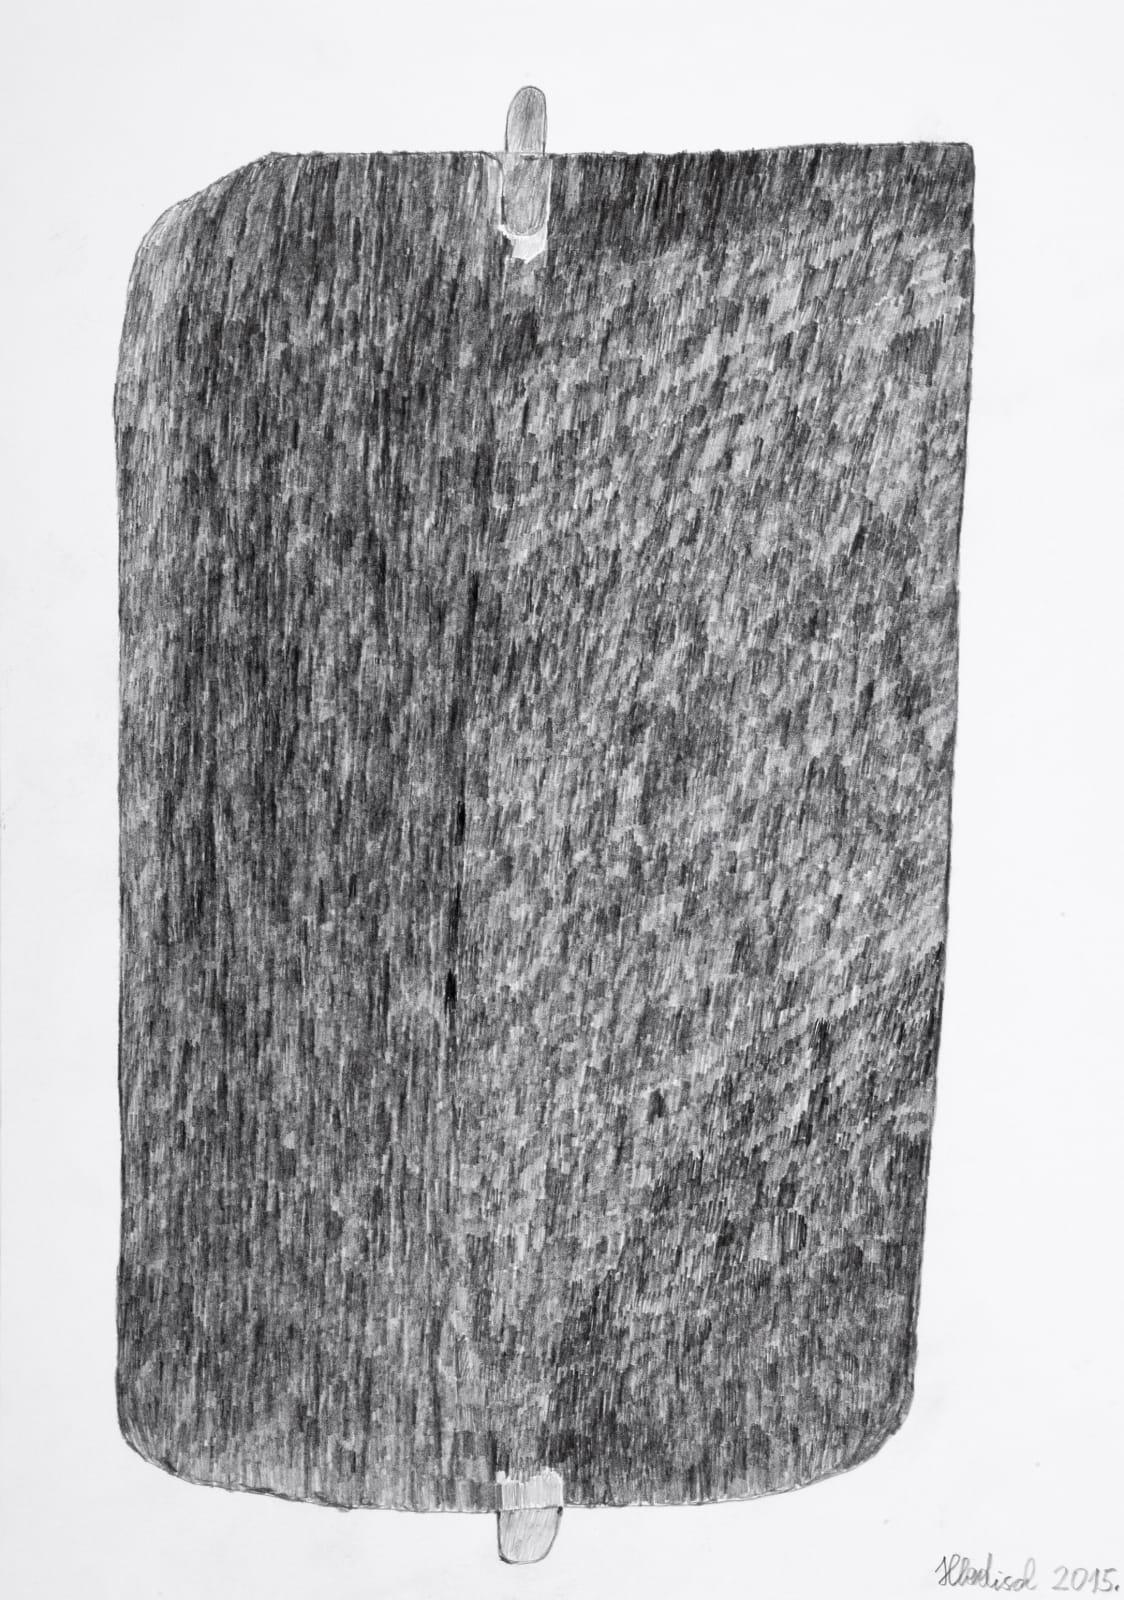 THERMOPHORE, 2015 Graphite on paper 16.5 x 11.7 in. (42 x 29.7 cm) HH 16 $3,400